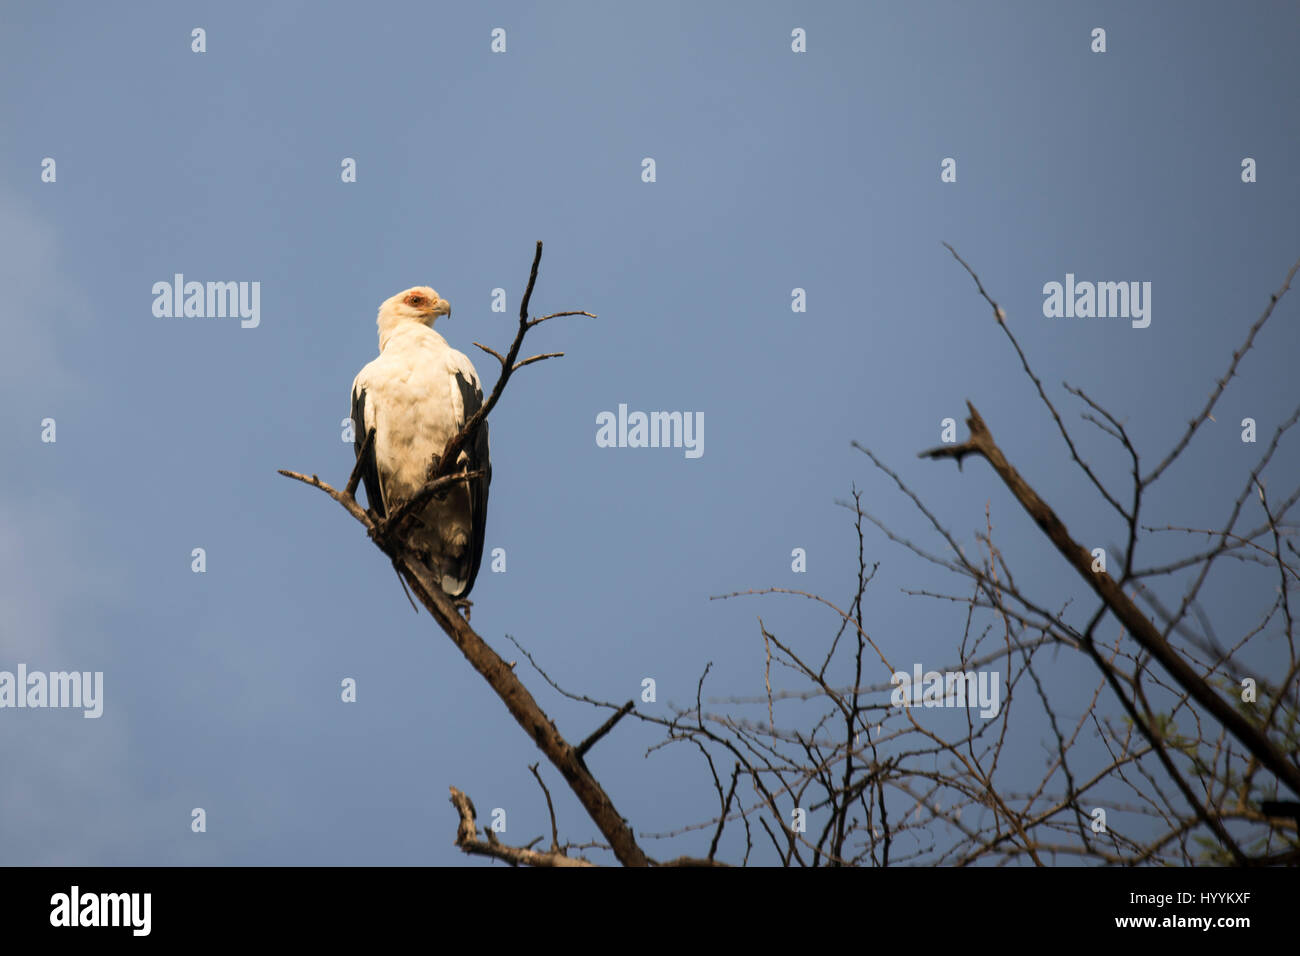 Palm nut vulture sitting on tree branch in Lake Manyara National Park, Tanzania, Africa. - Stock Image